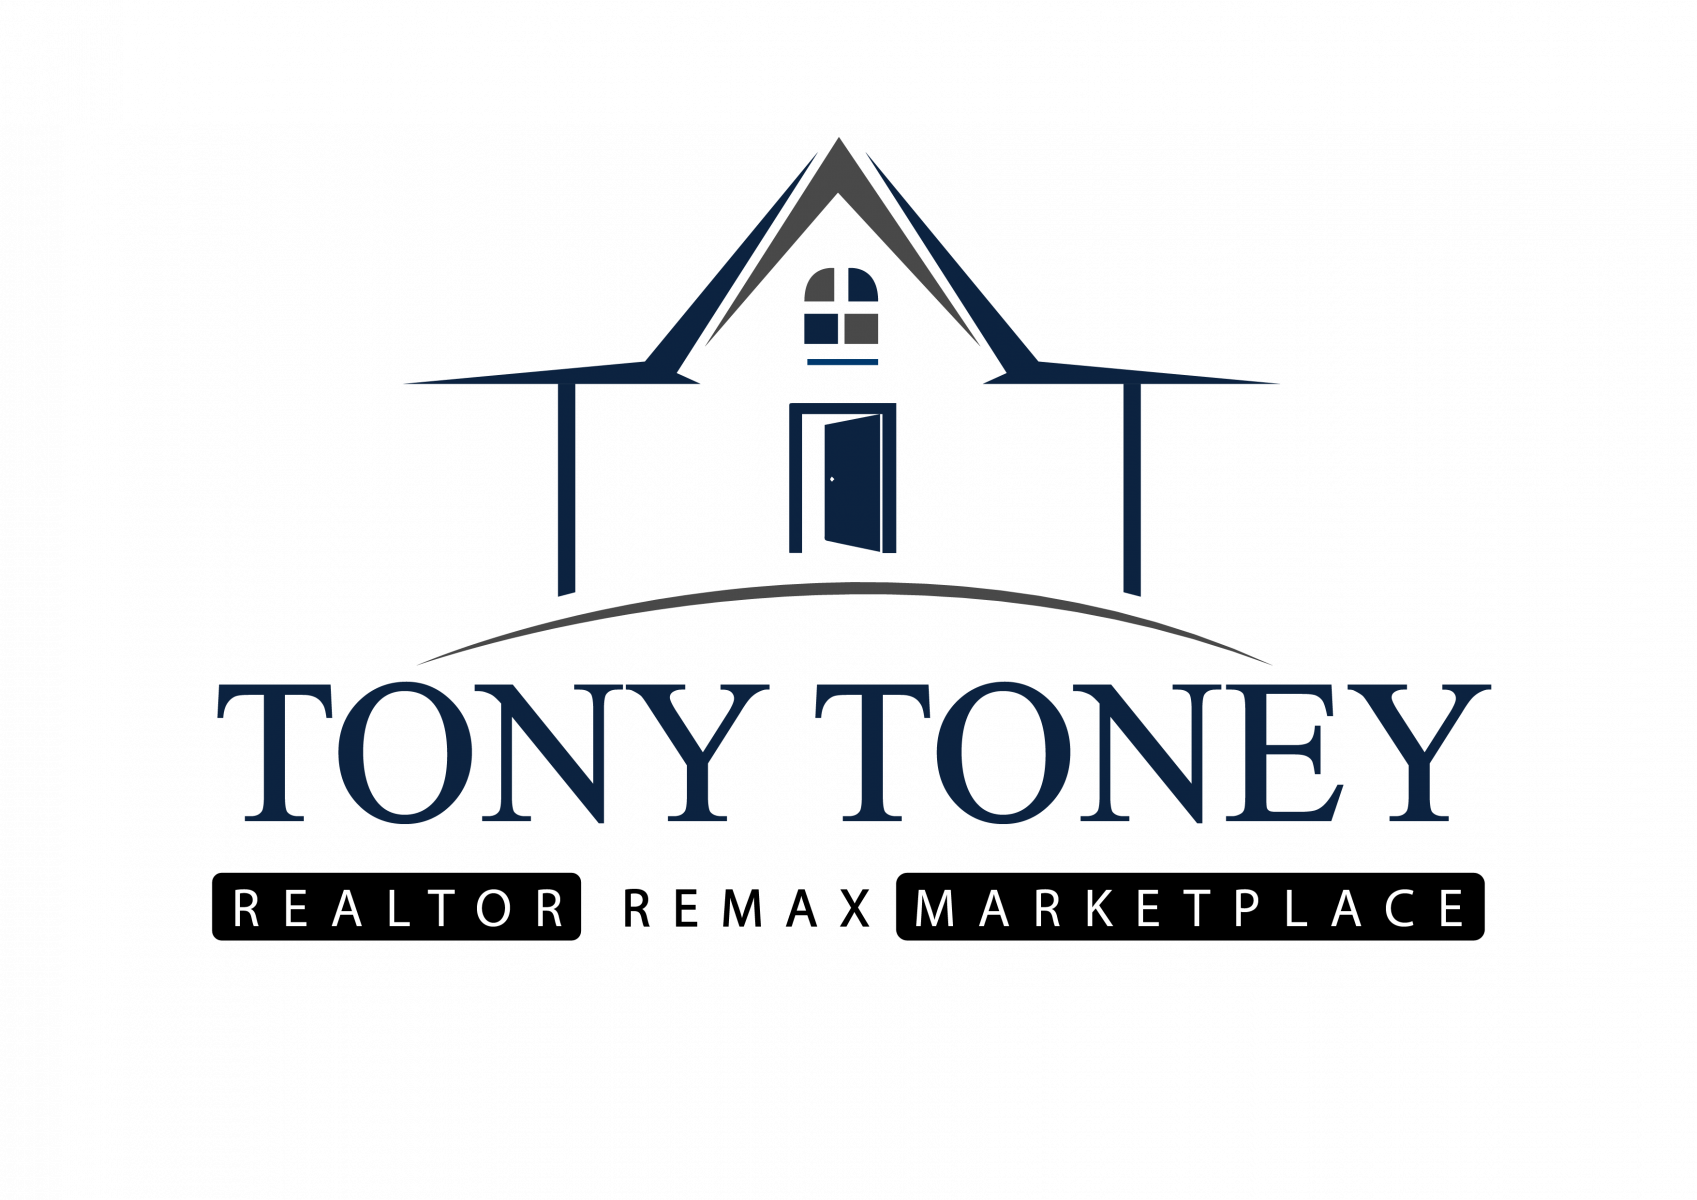 Tonytoneyhomes logo